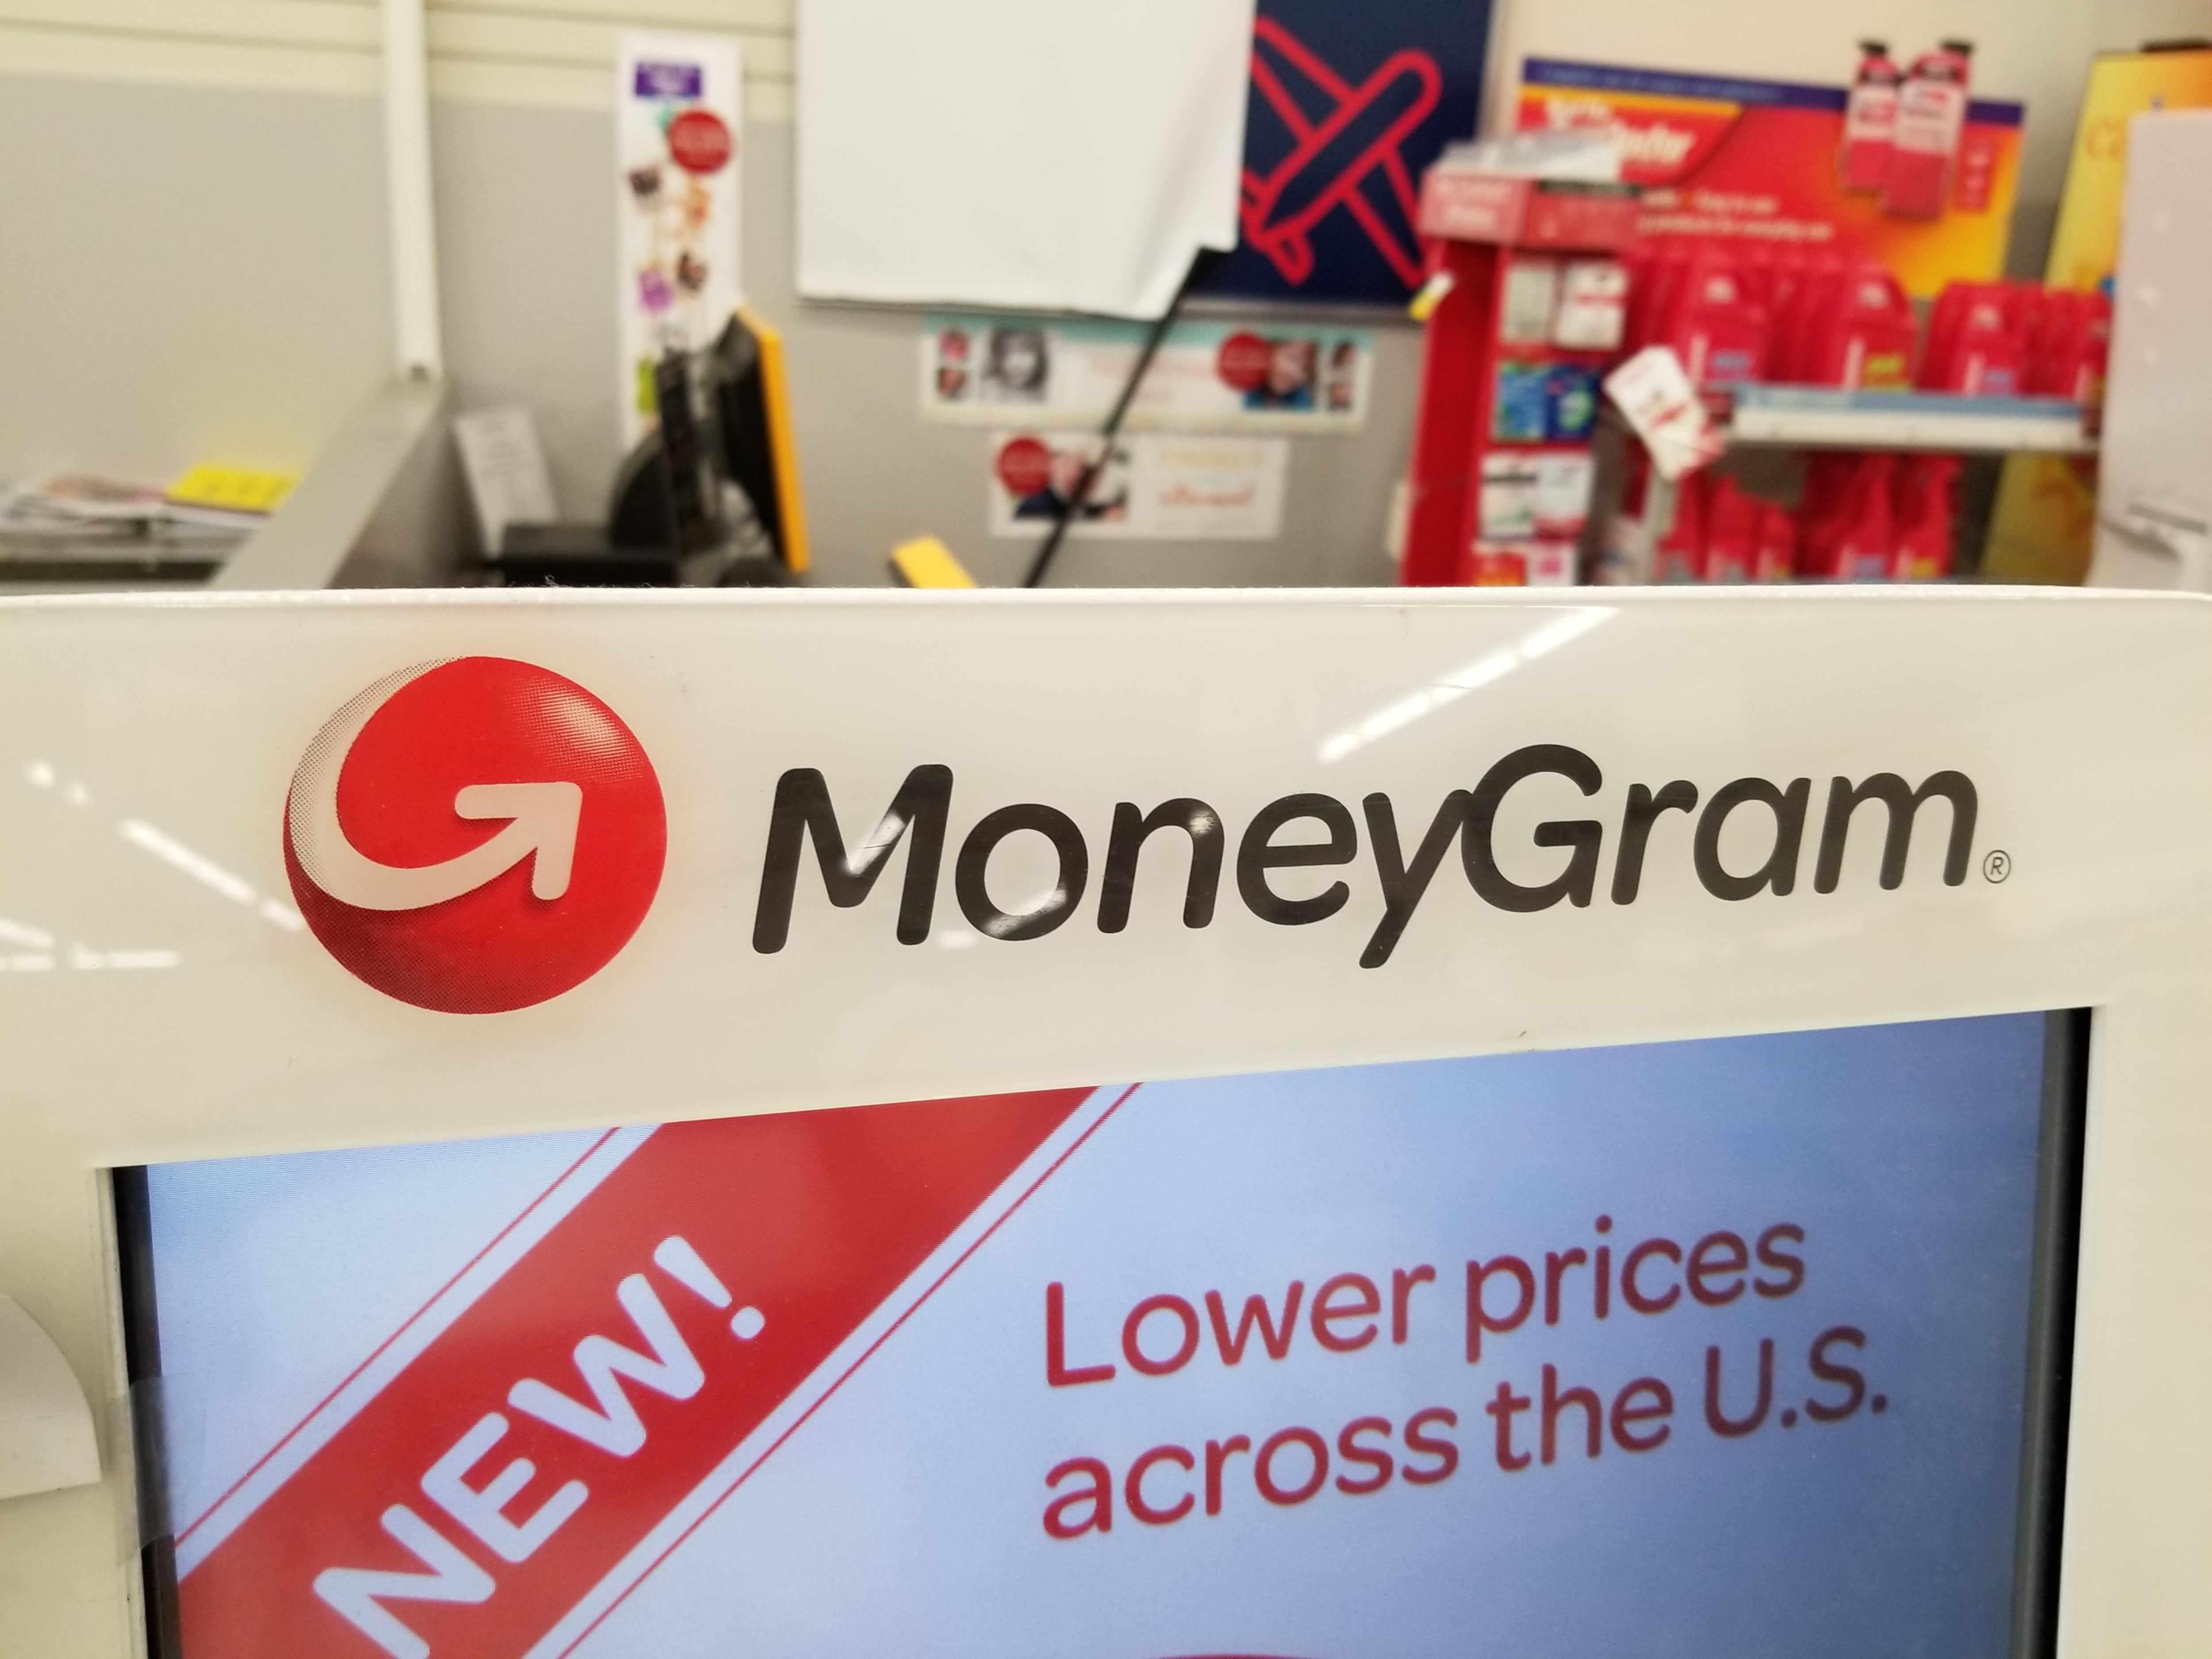 moneygram cryptocurrency holders investments cash